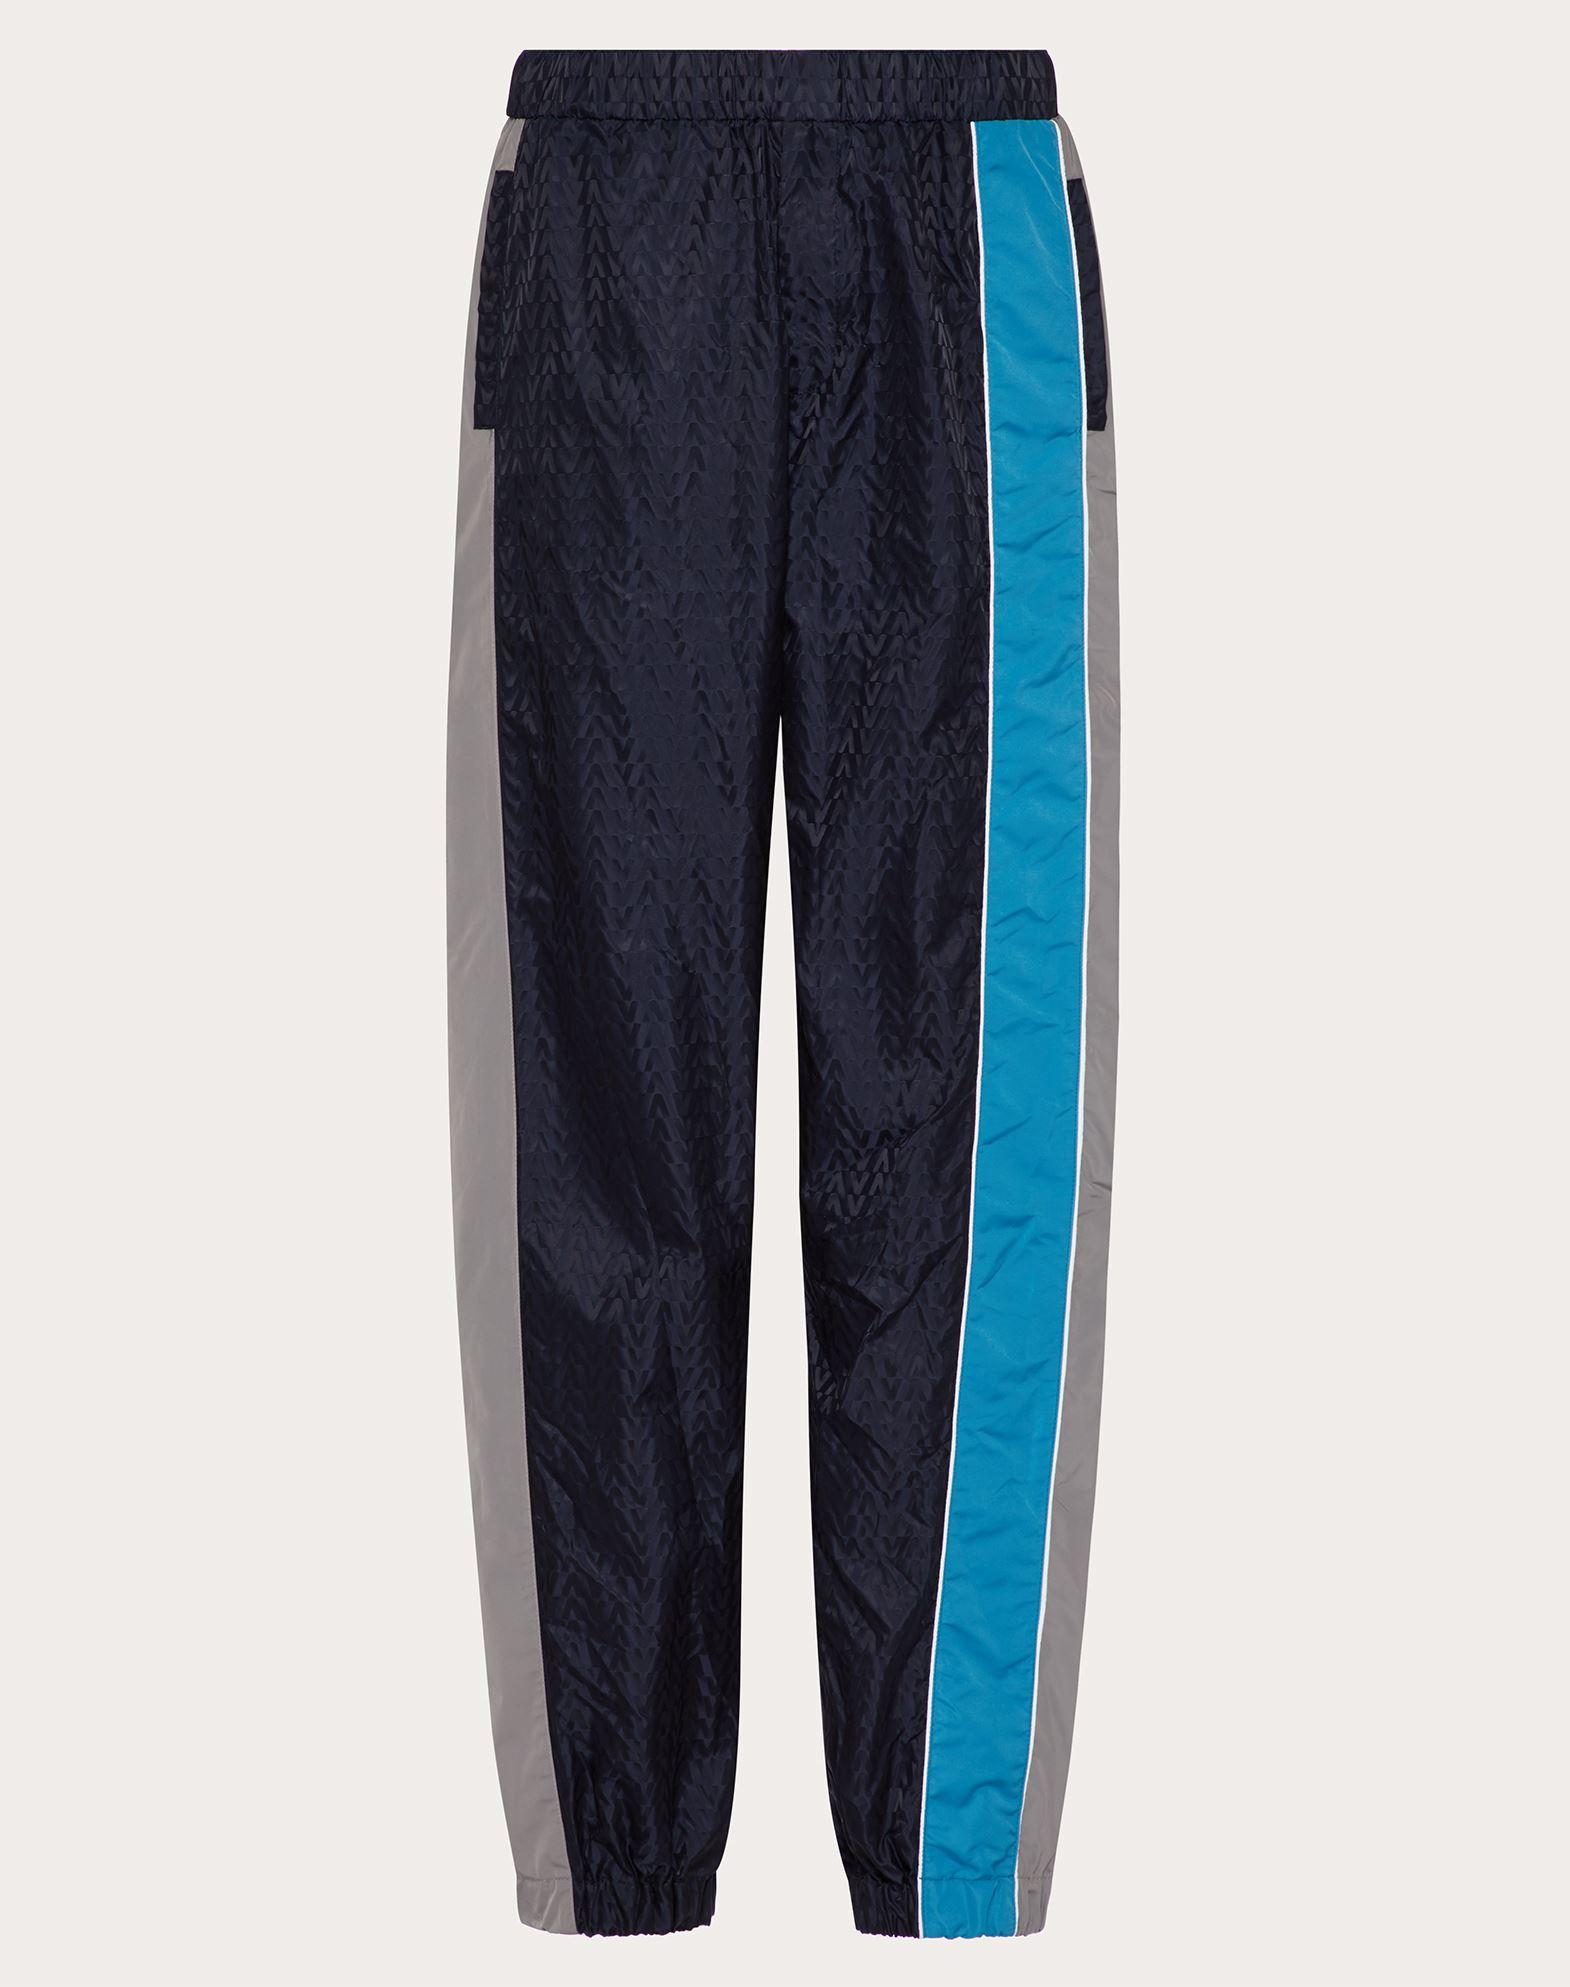 Valentino Uomo Hose Aus Nylon Mit Optical -motiv Herren Navy Blue 100% Poliammide 48 In Multi